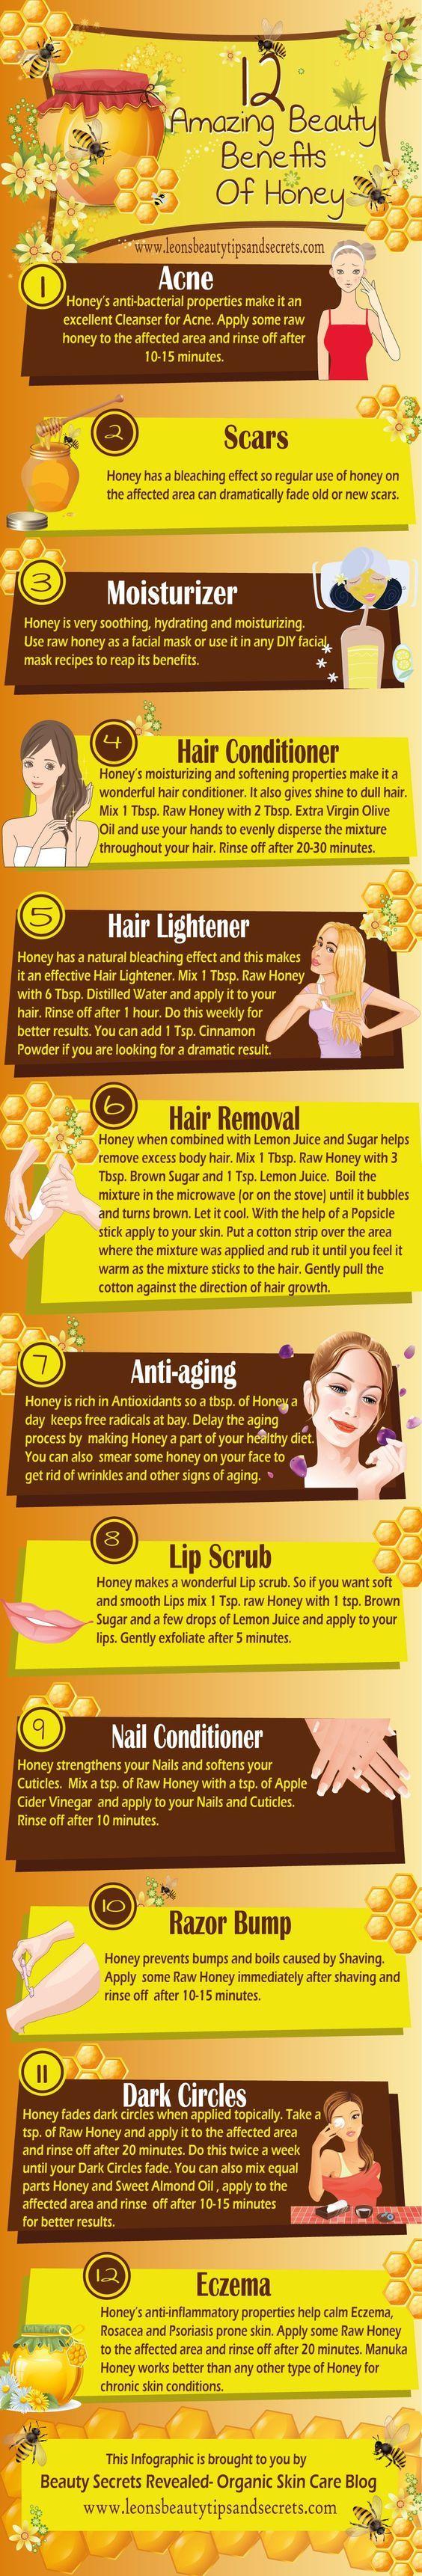 12 Amazing Beauty Benefits Of Honey   #Infographic #Beauty #Honey: